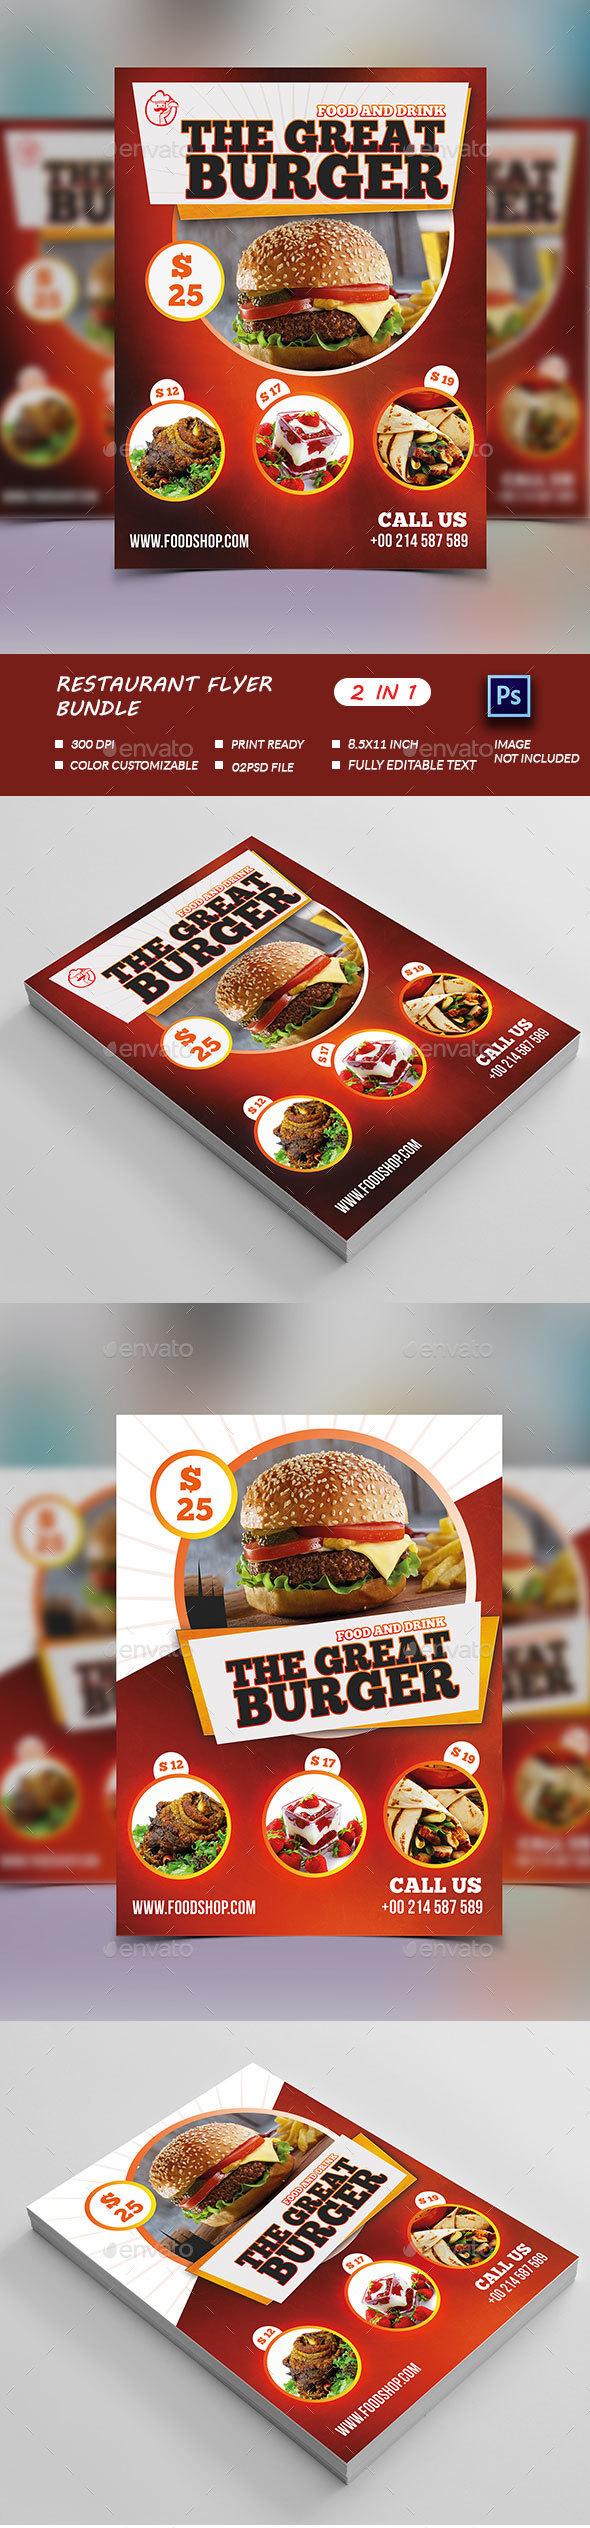 Restaurant Flyer Bundle  - Restaurant Flyers